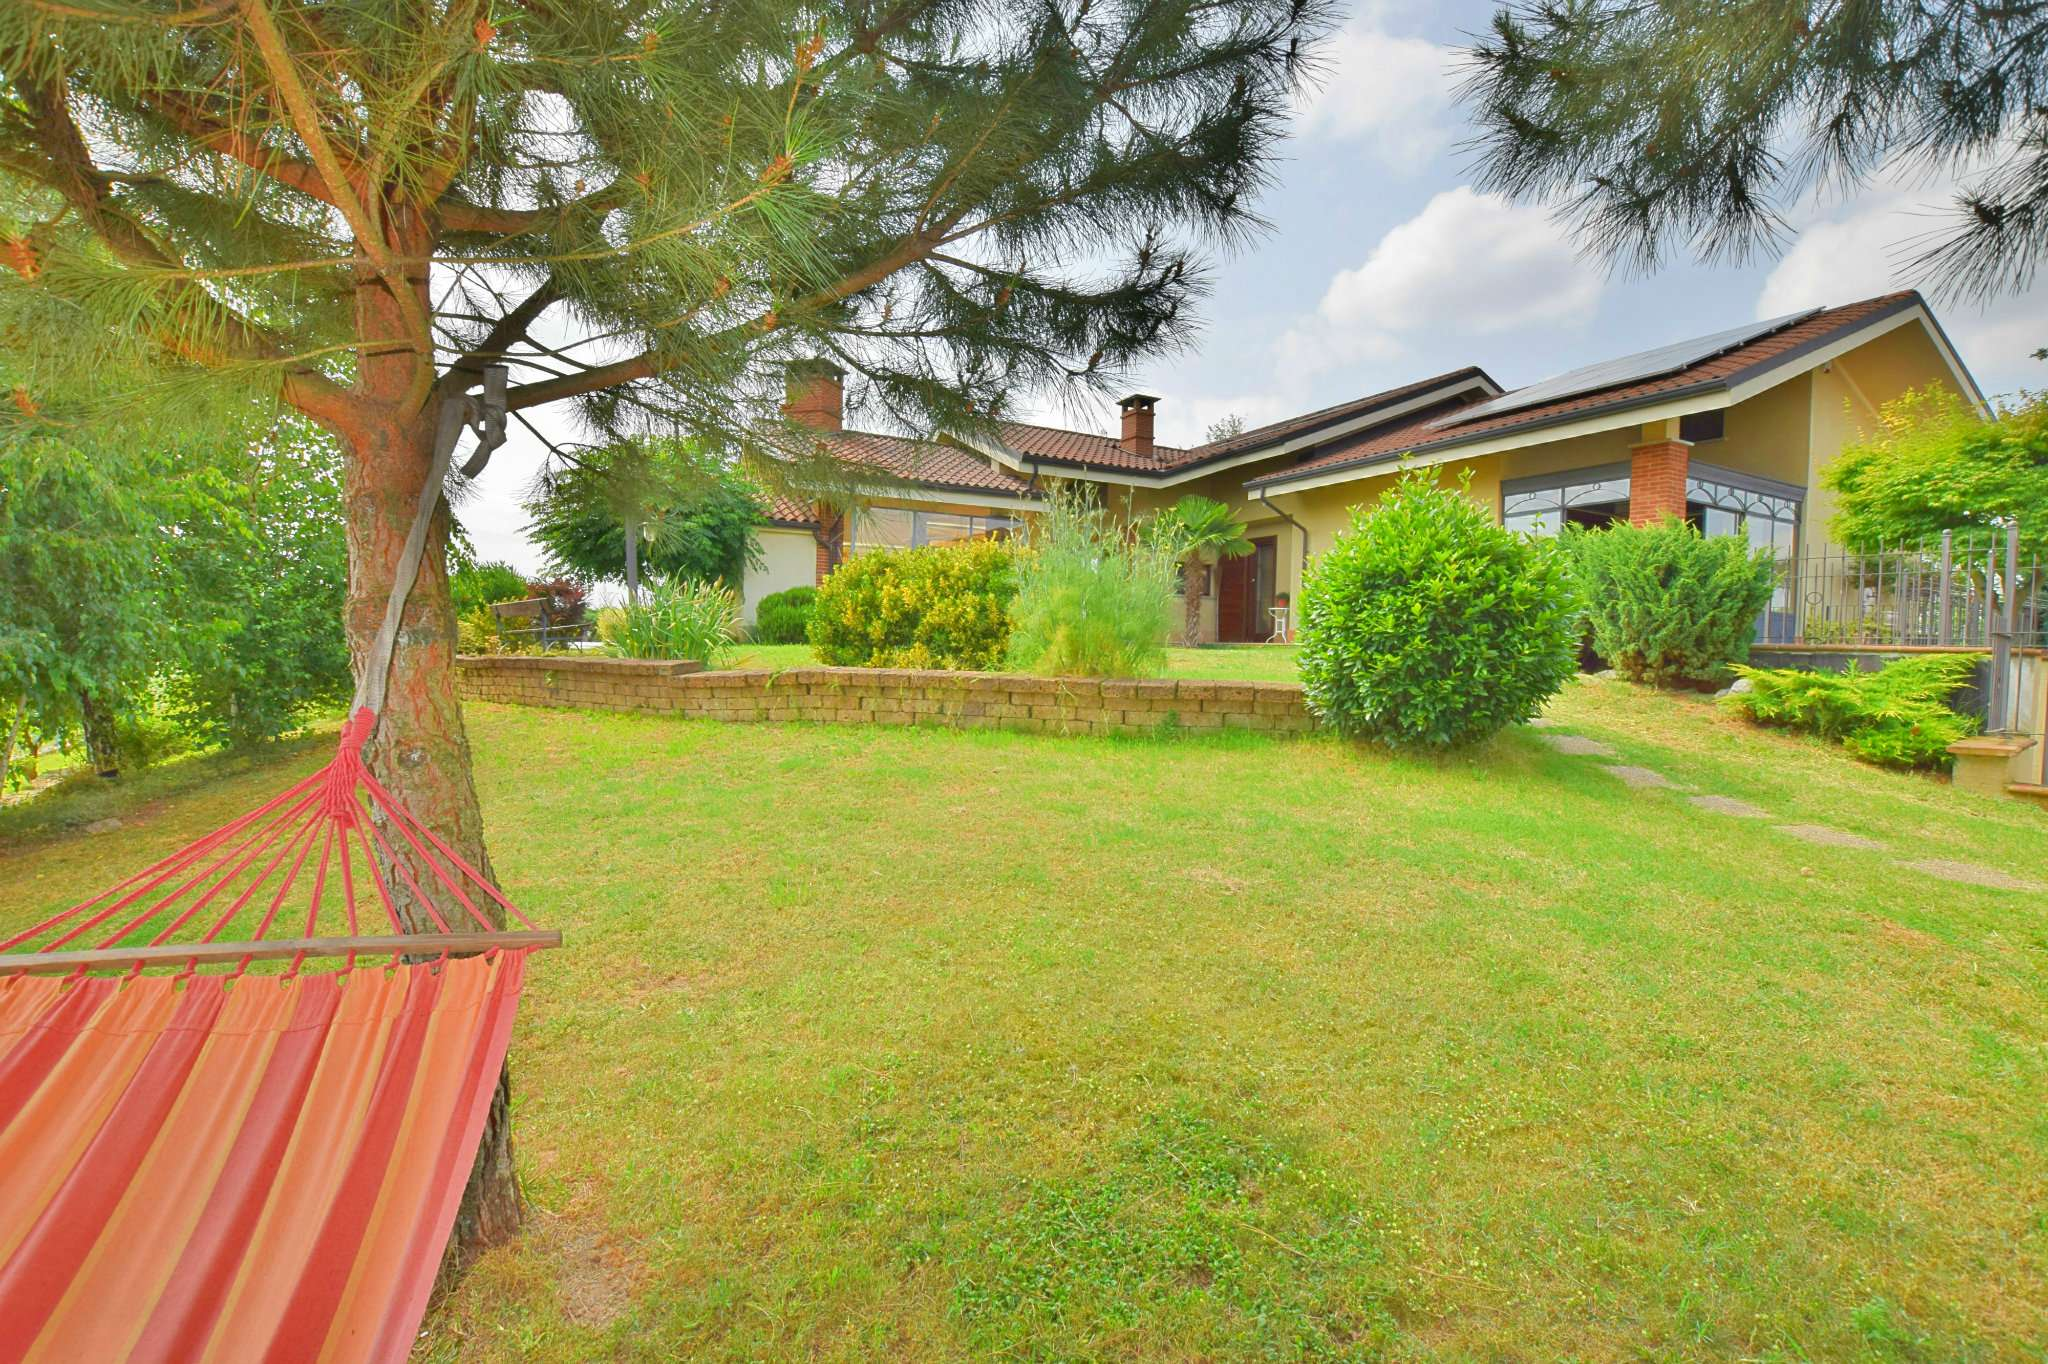 Villa in vendita Rif. 7519598